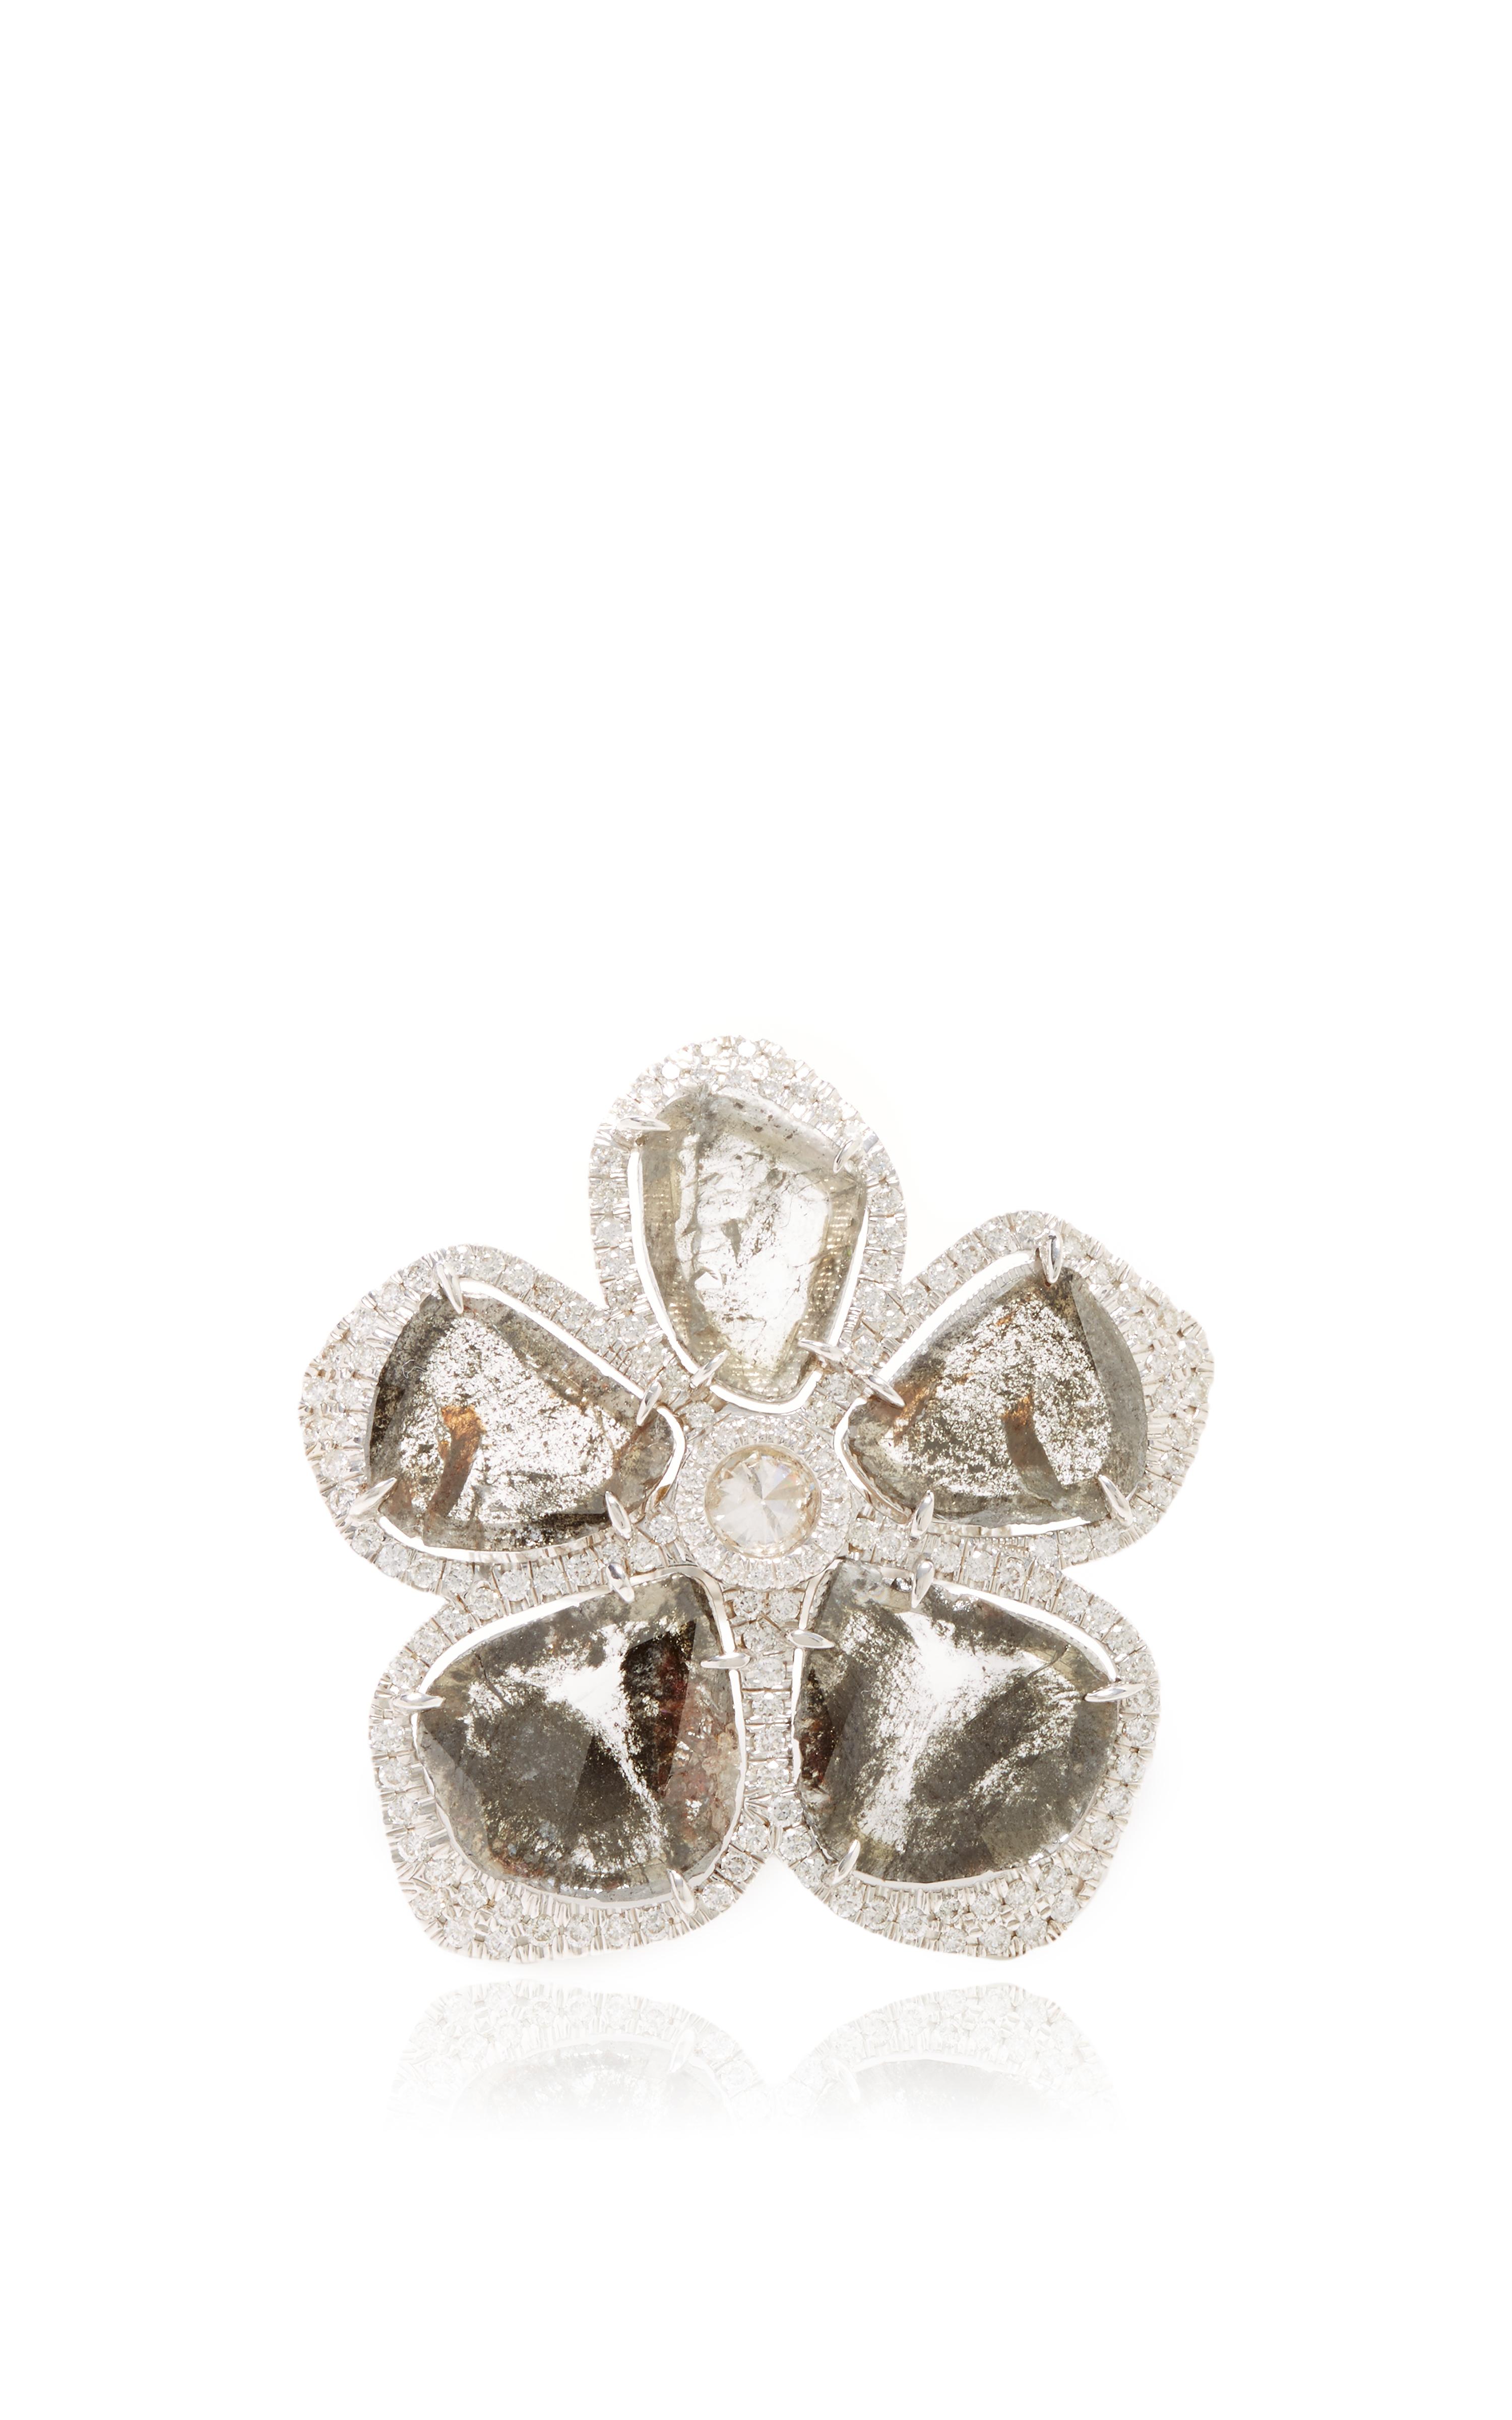 Nina runsdorf 18K White Gold And Diamond Slice Flower Ring in Silver